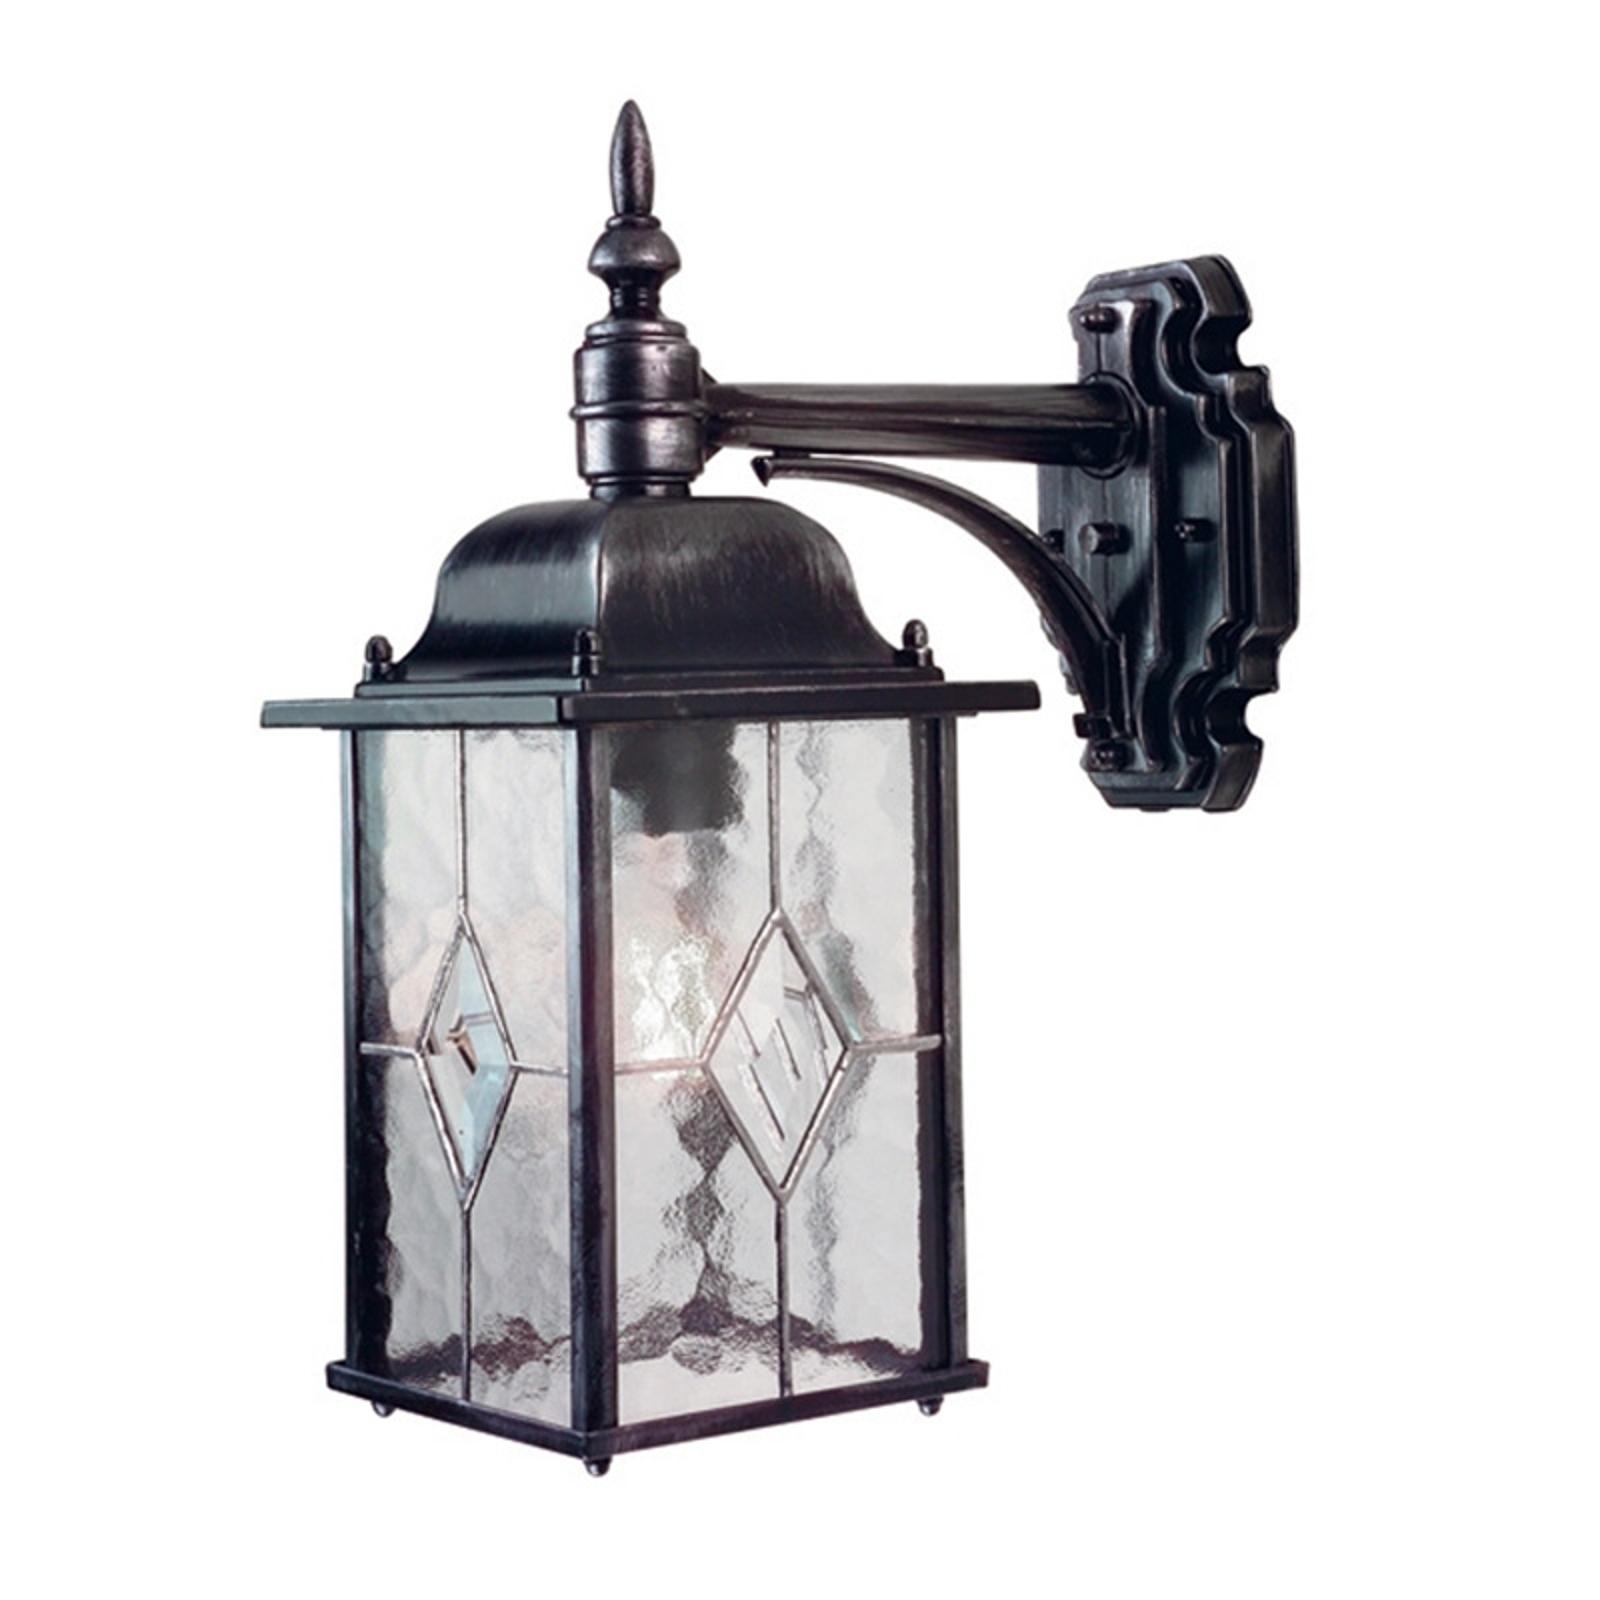 Vägglykta WEXFORD i lanternform